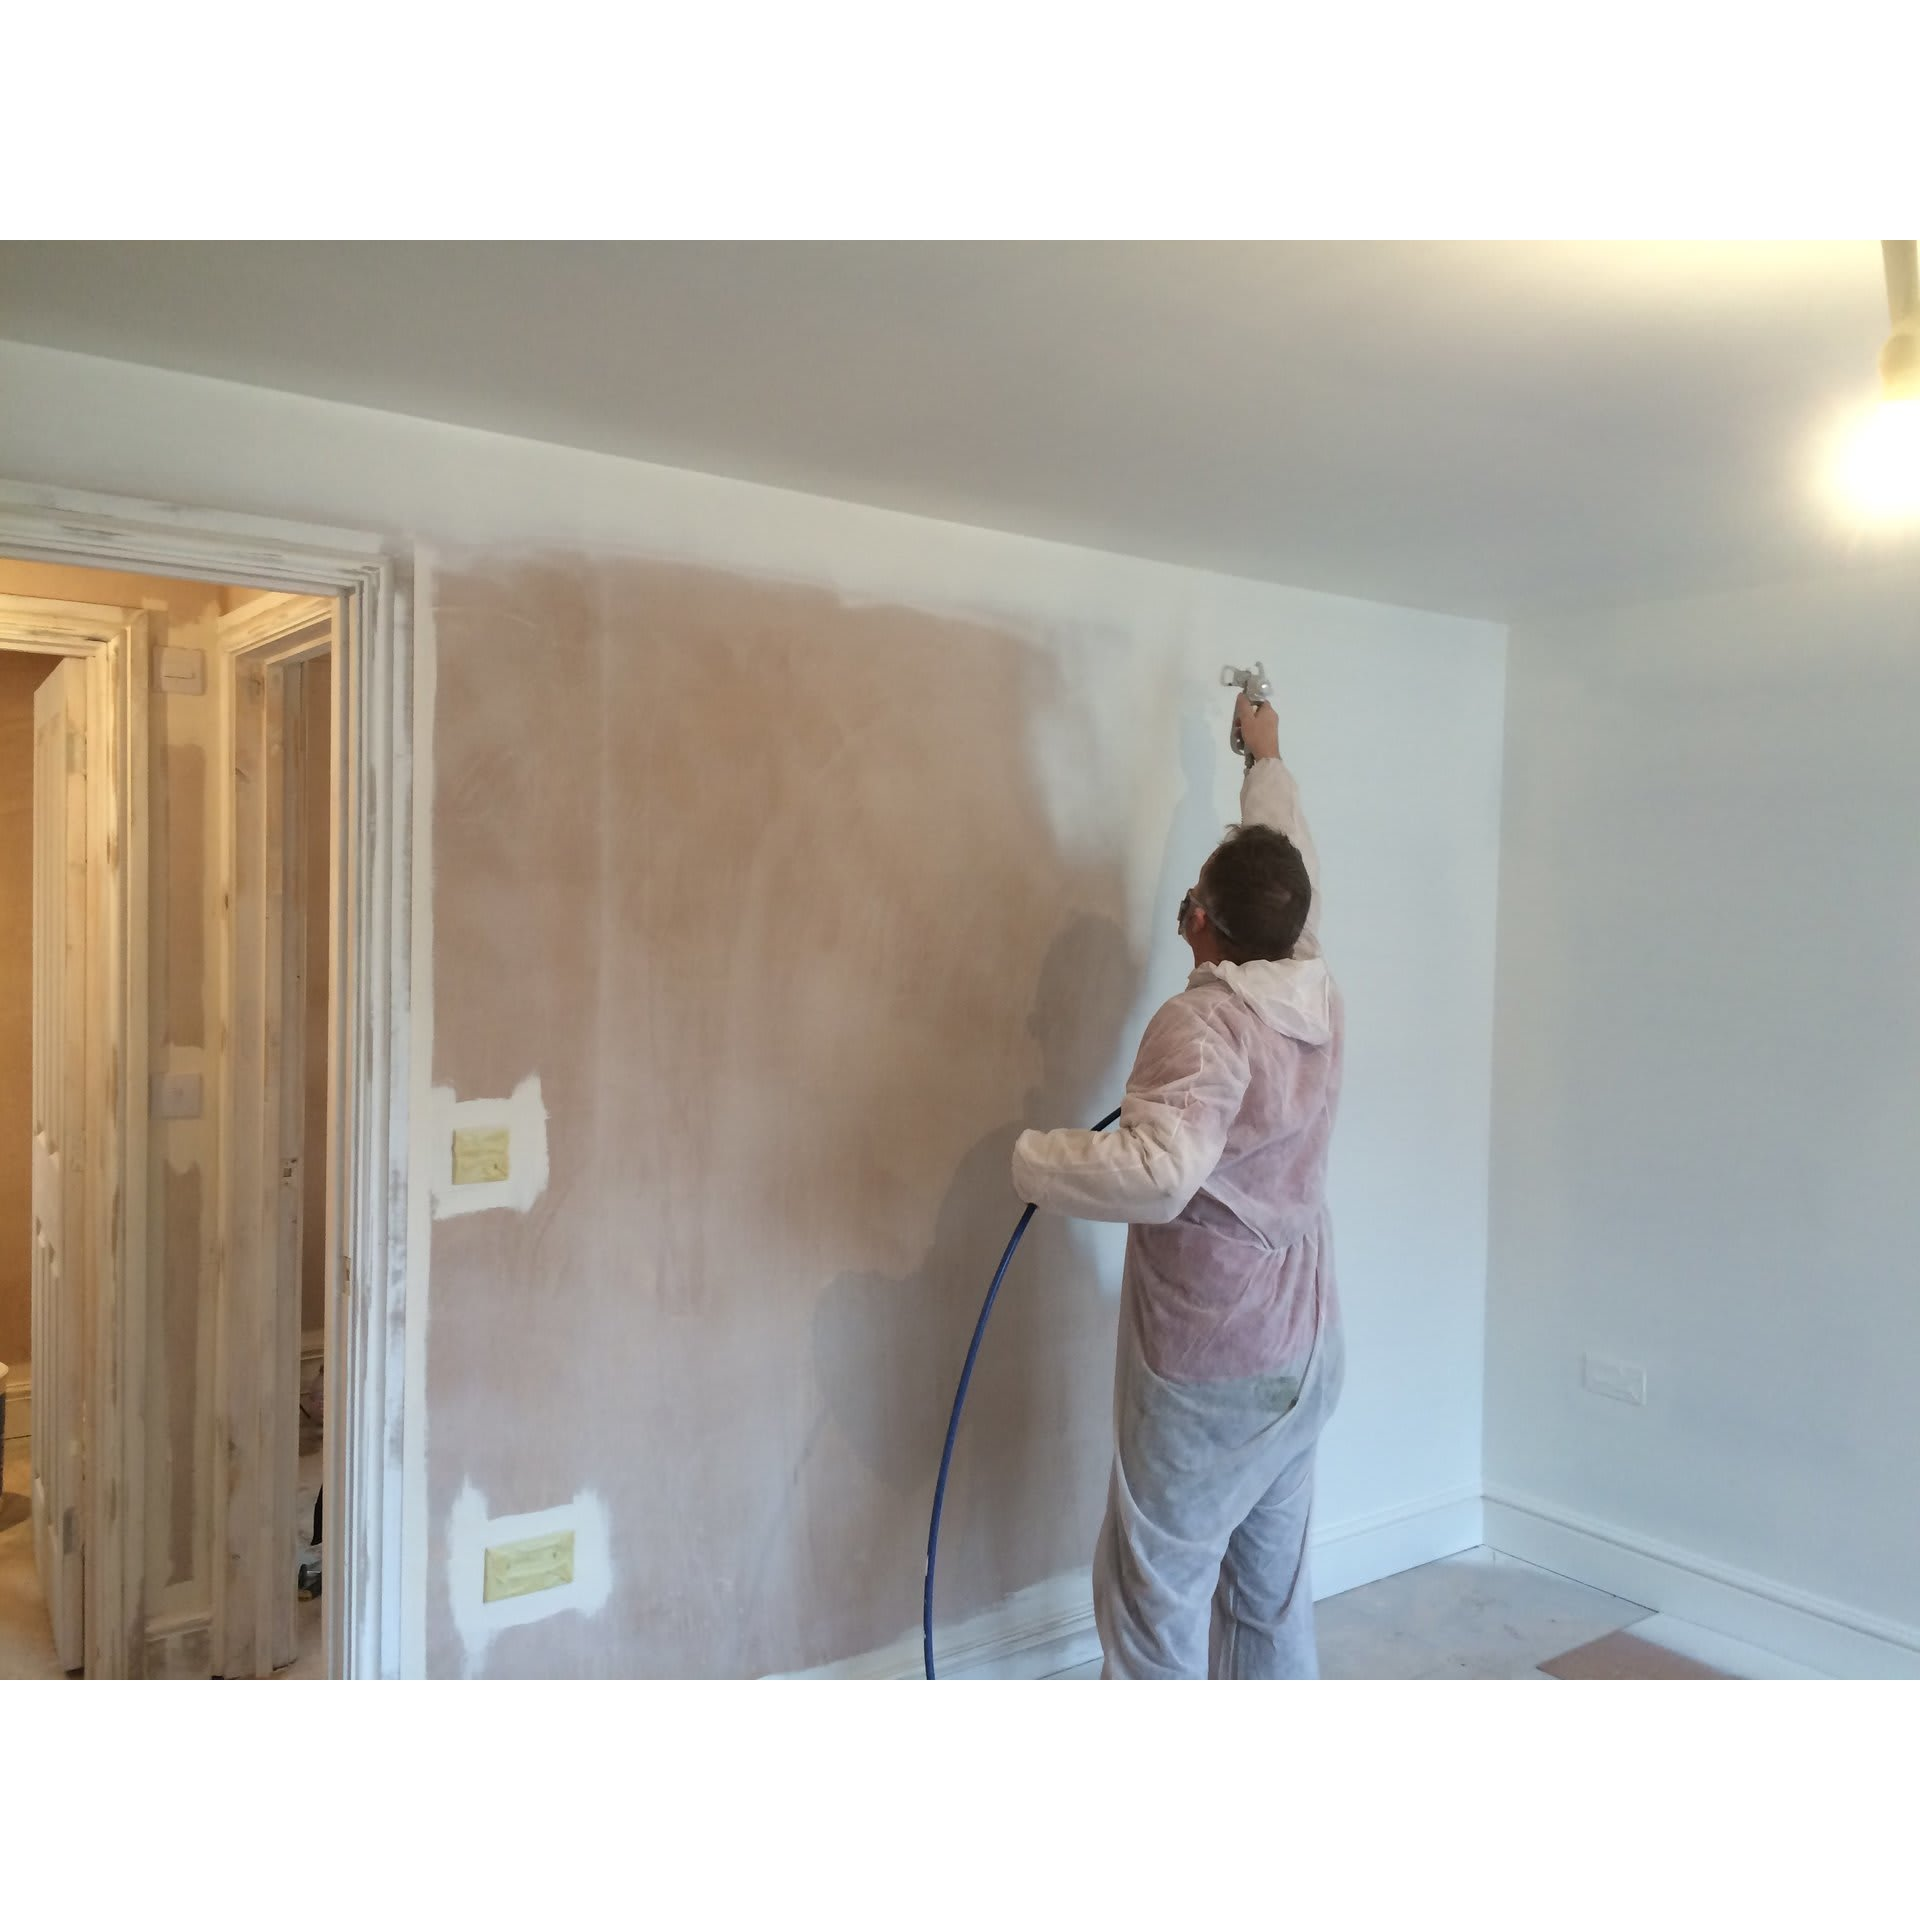 Just Mint Decorating & Property Maintenance - Sherborne, Dorset DT9 5LX - 07976 565285 | ShowMeLocal.com